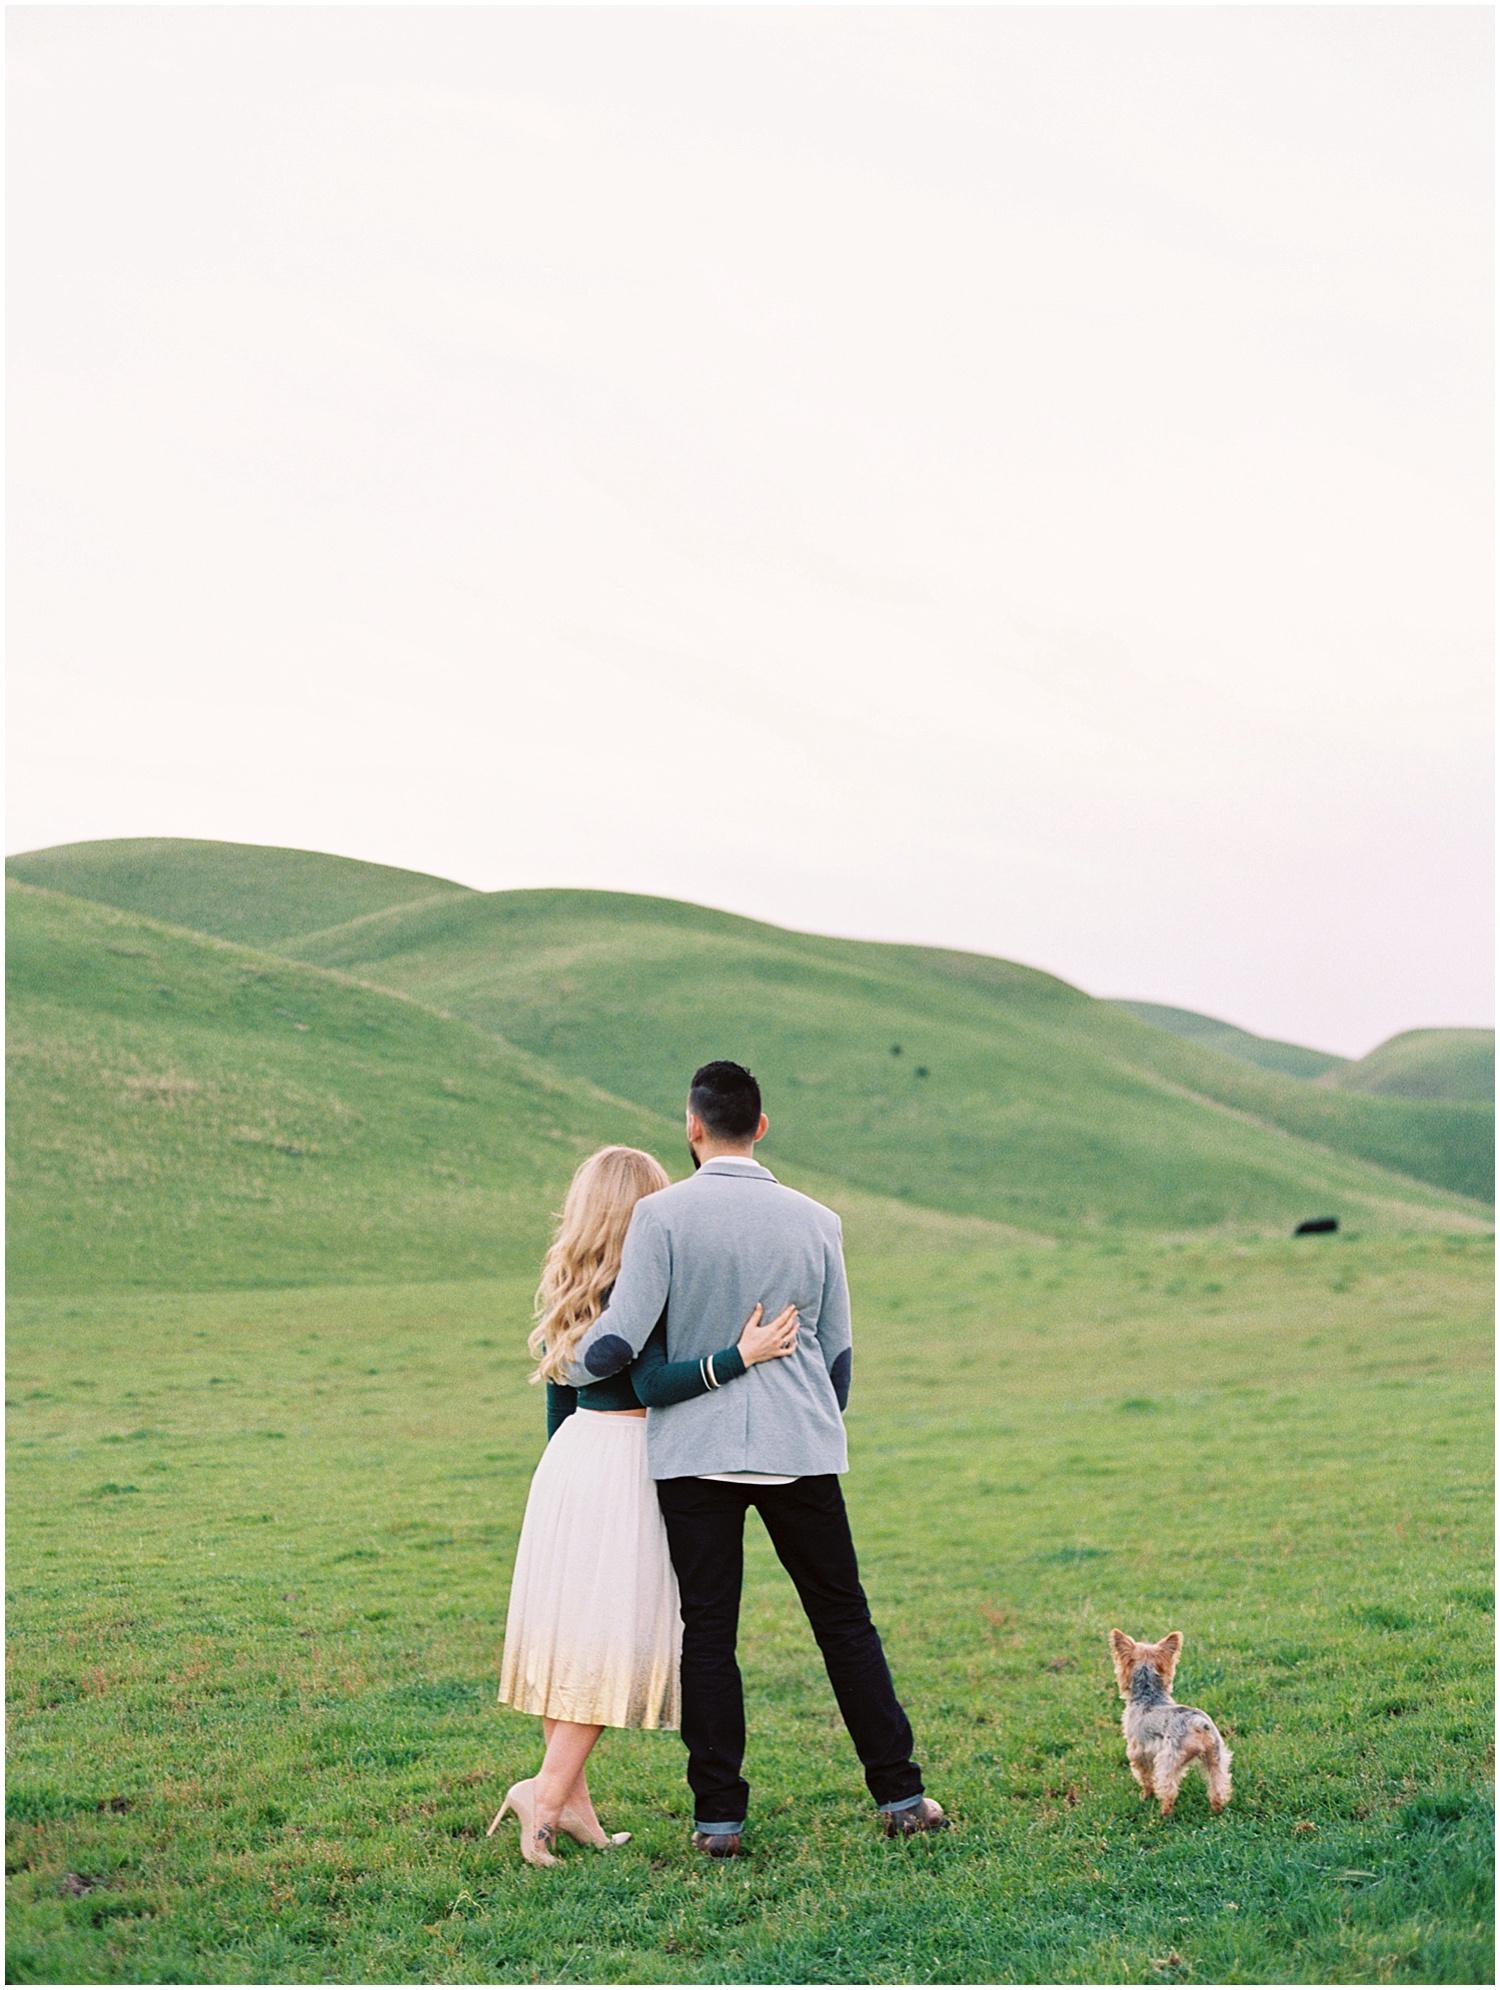 Napa_Engagement_Photos_013.jpg